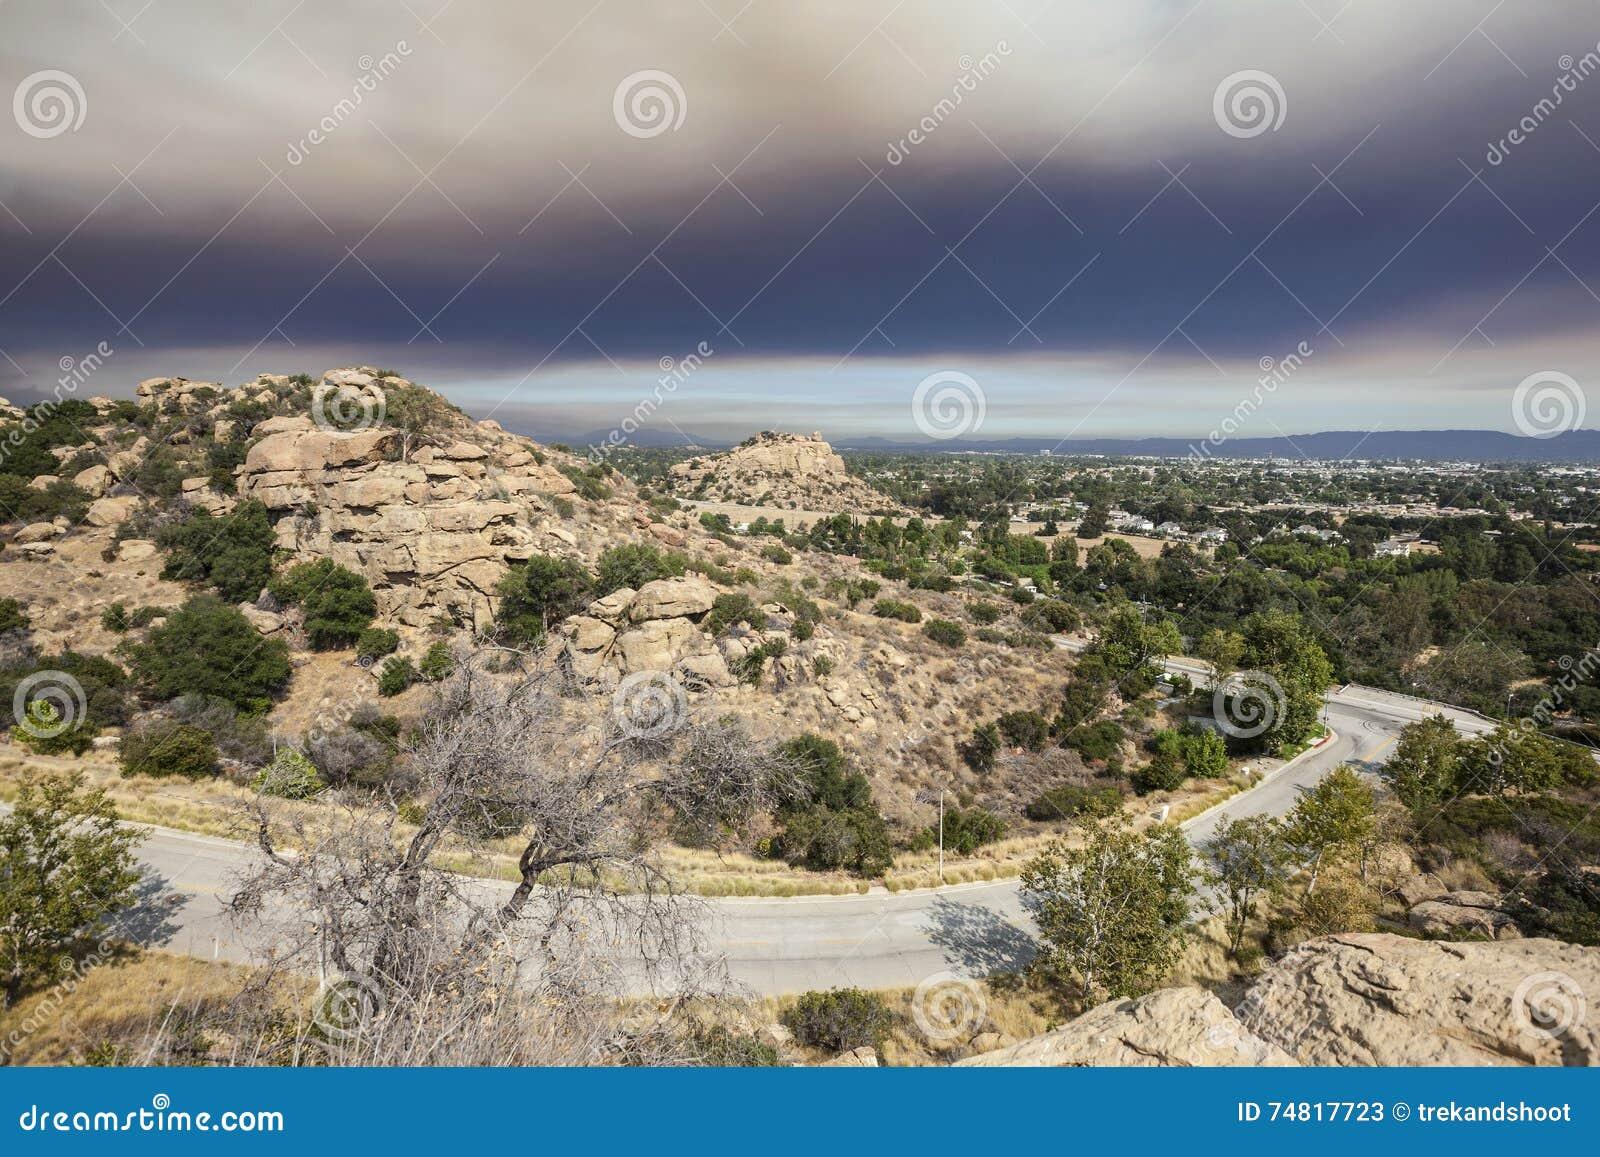 Los Angeles San Fernando Valley Mit Feuer Rauch Himmel Stockbild ...